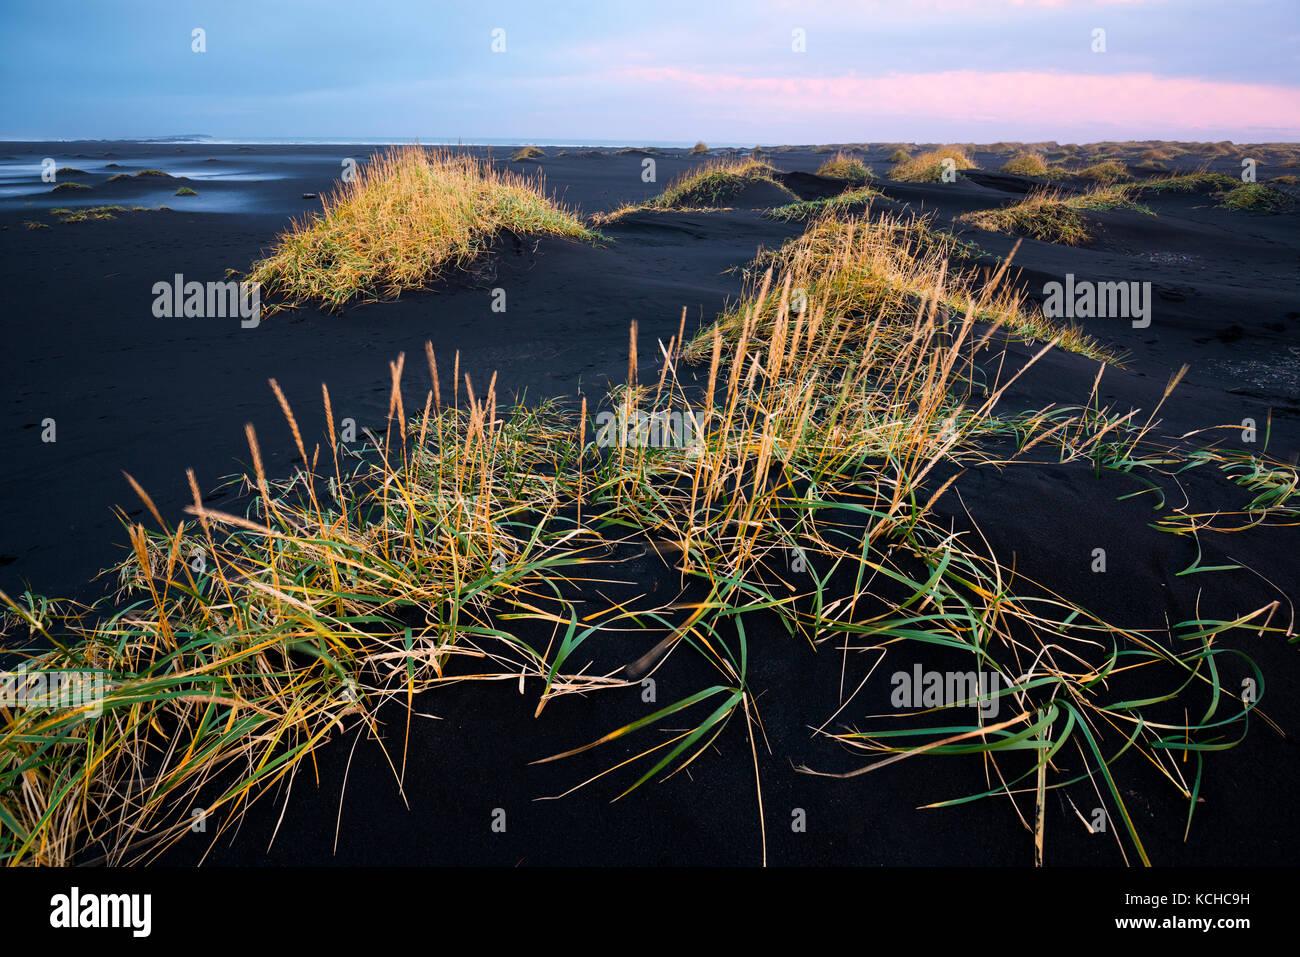 Tufts of Grass on a Black Sandy Beach, Stokksnes, Iceland - Stock Image